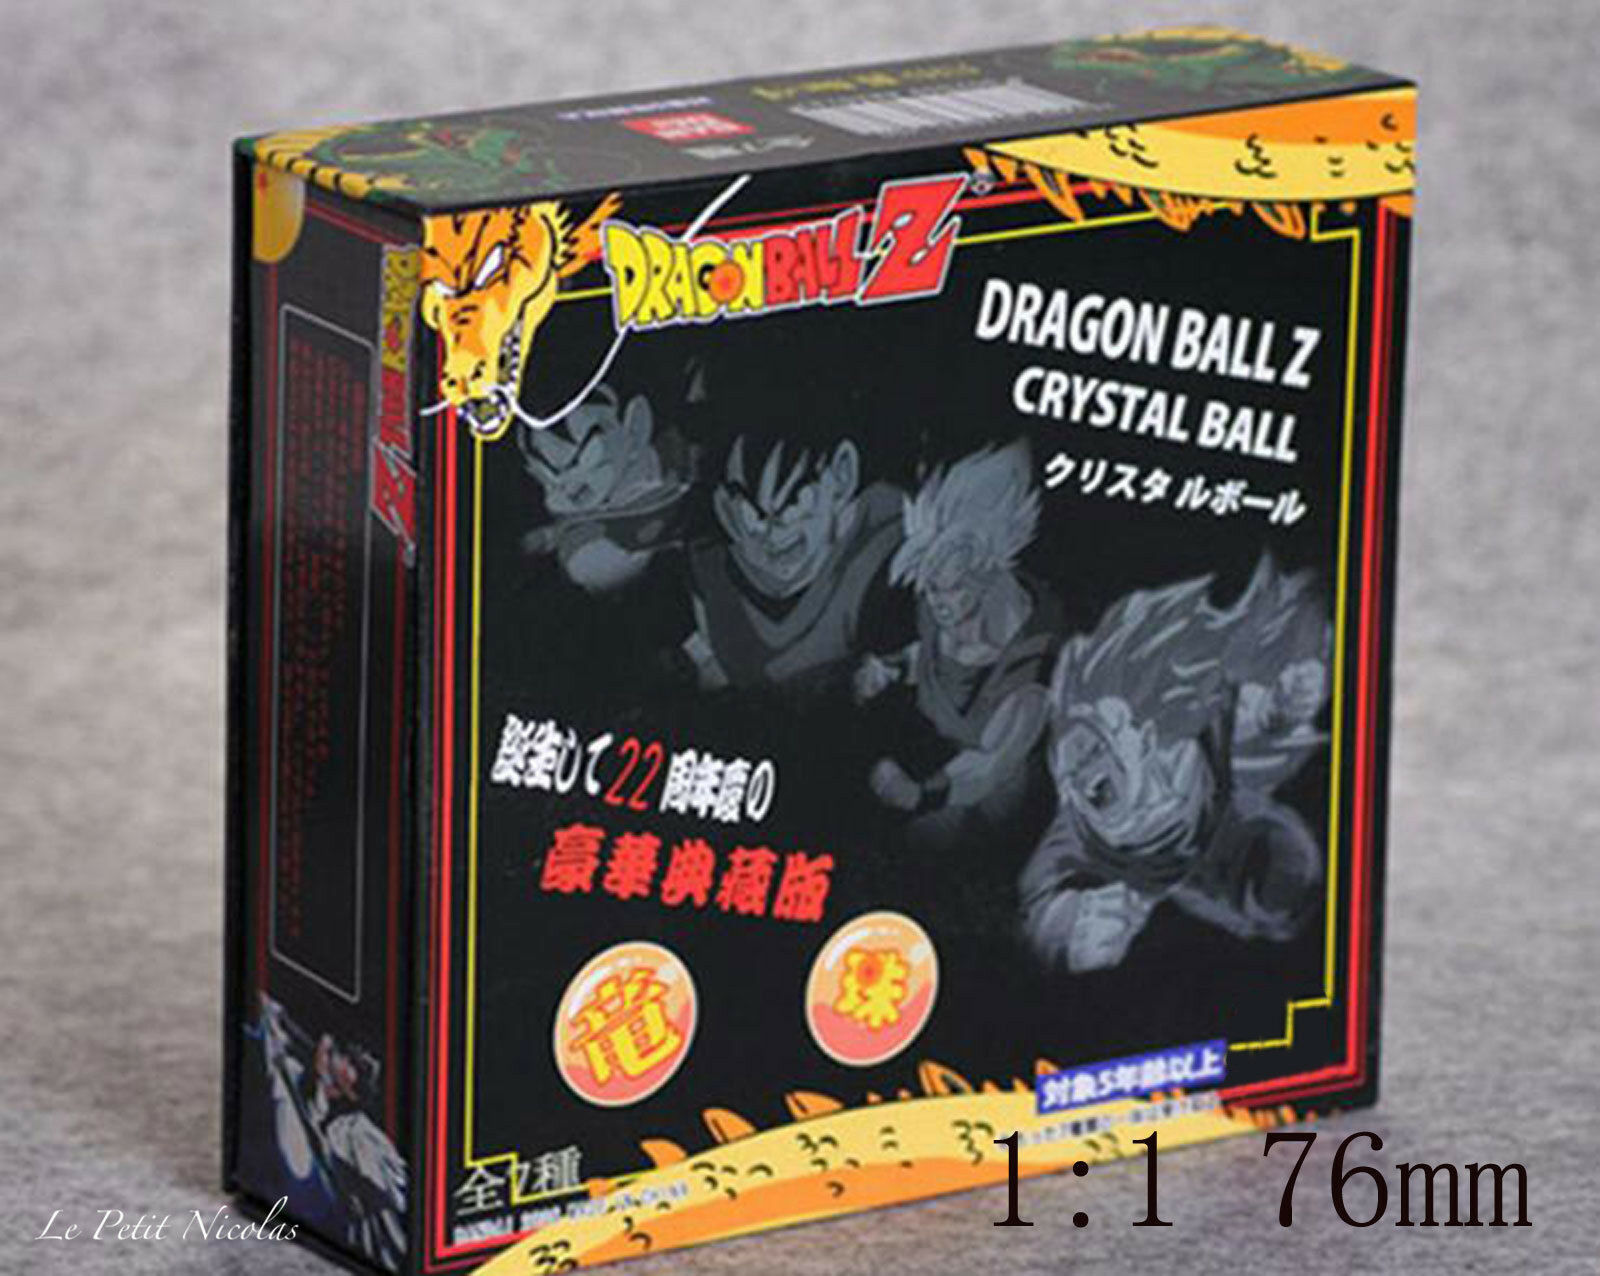 Dragon Ball Z DBZ lote de siete DRAGON bolas muy grandes 1 1 diámetro 76mm bolas